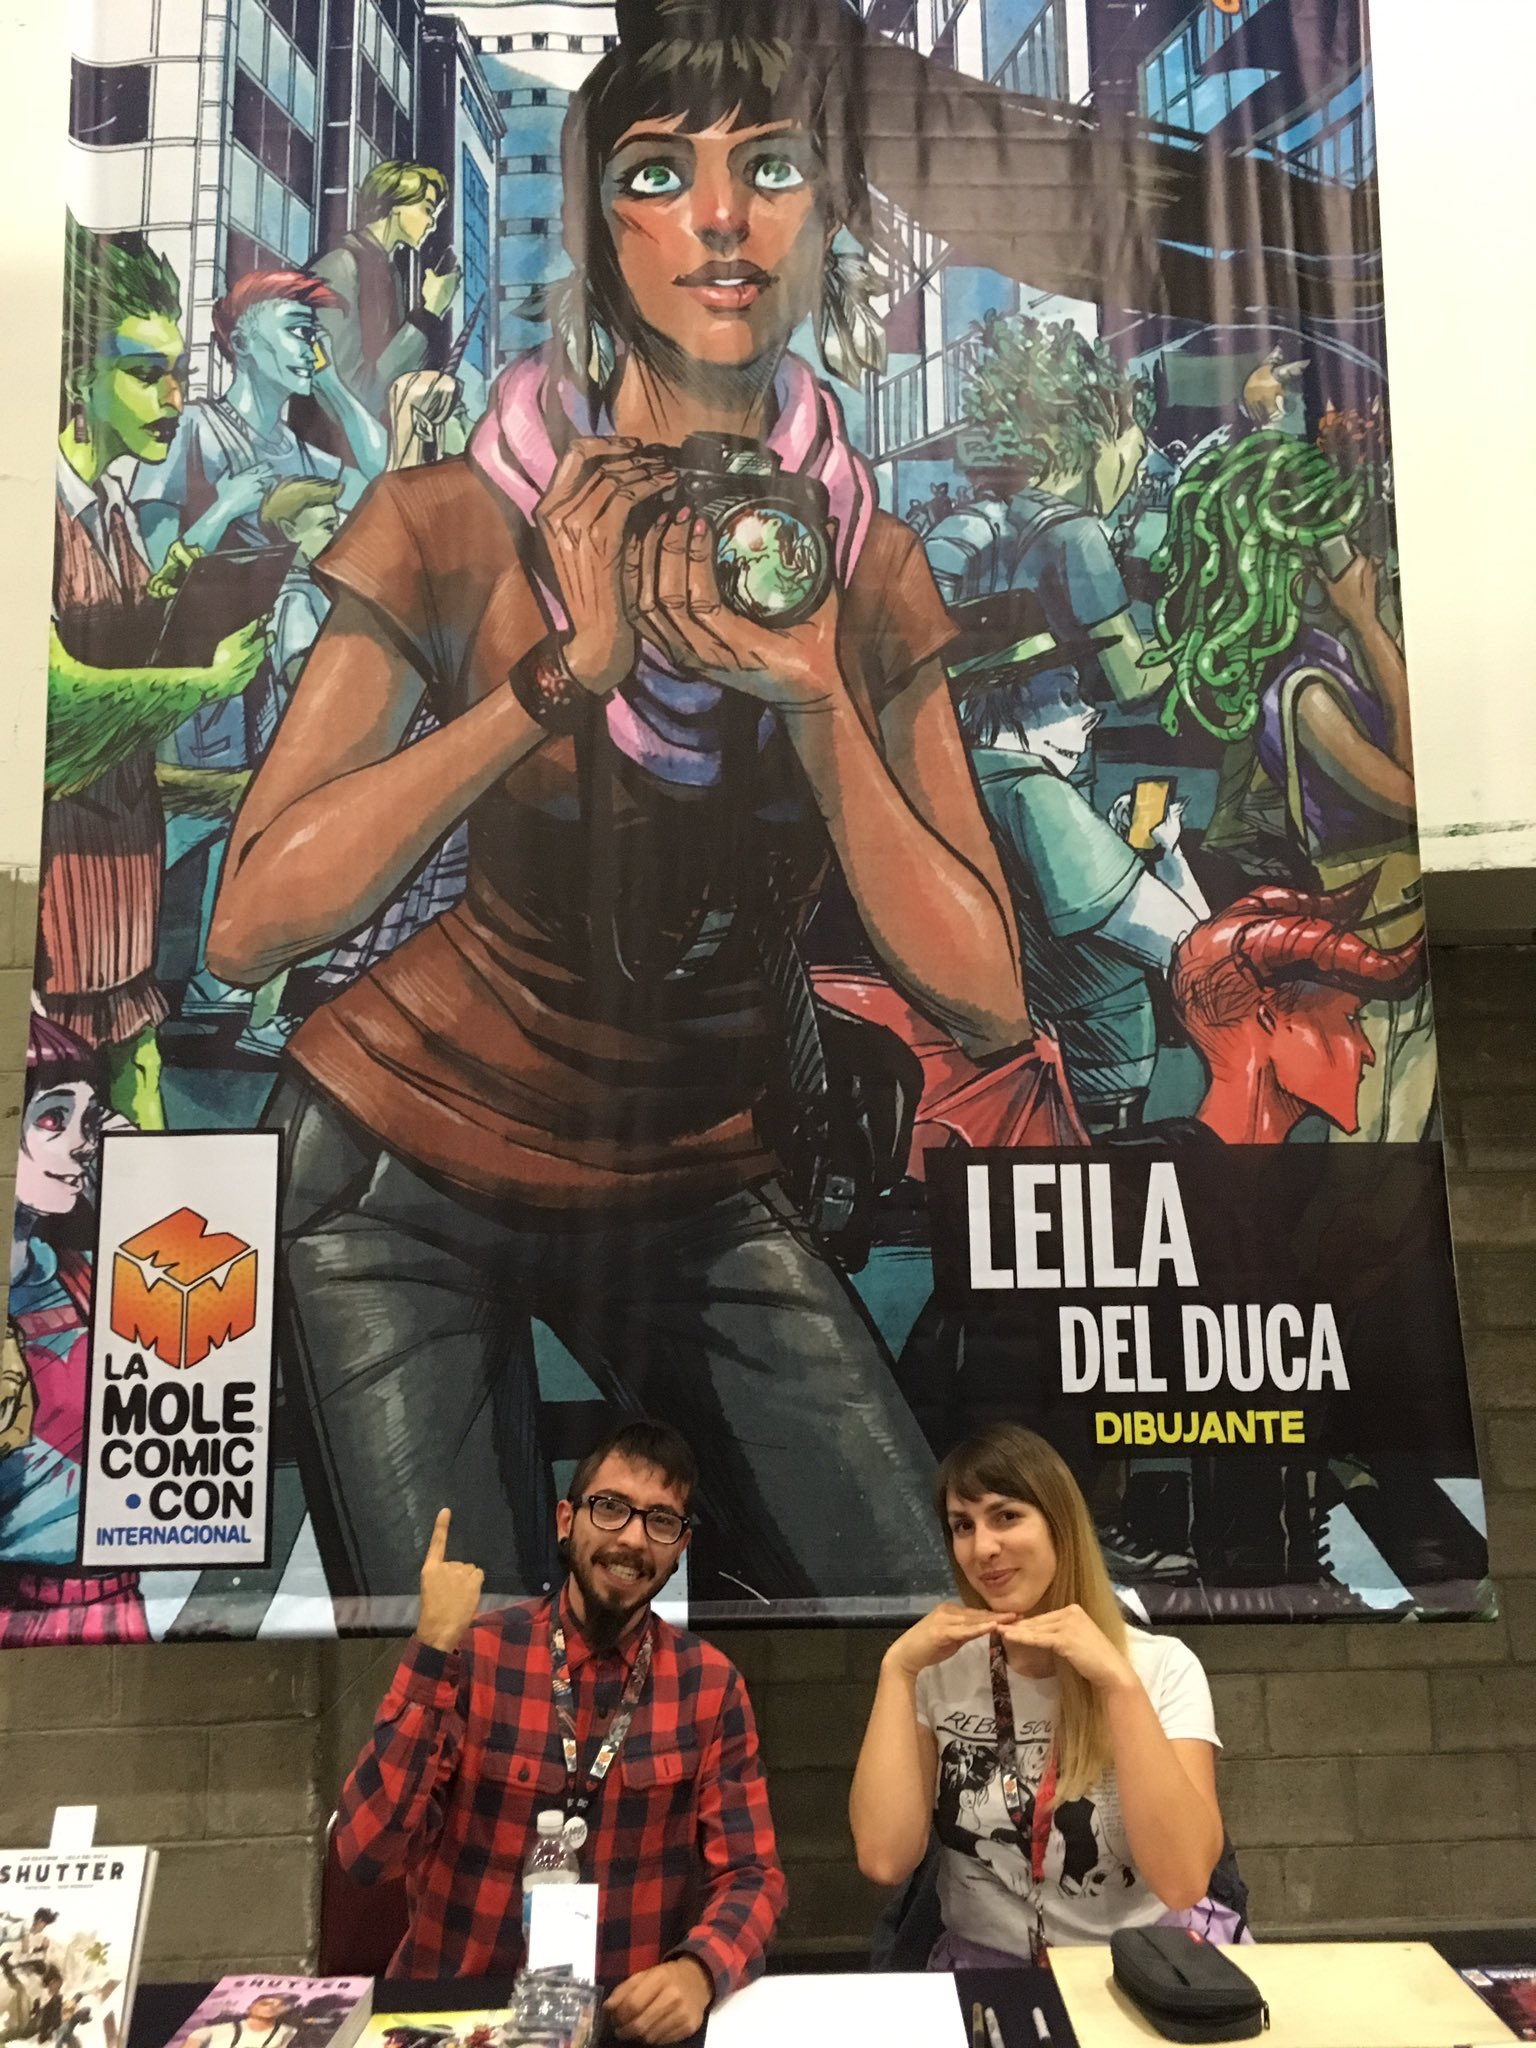 Lona Mate La Mole Nov 2017-9